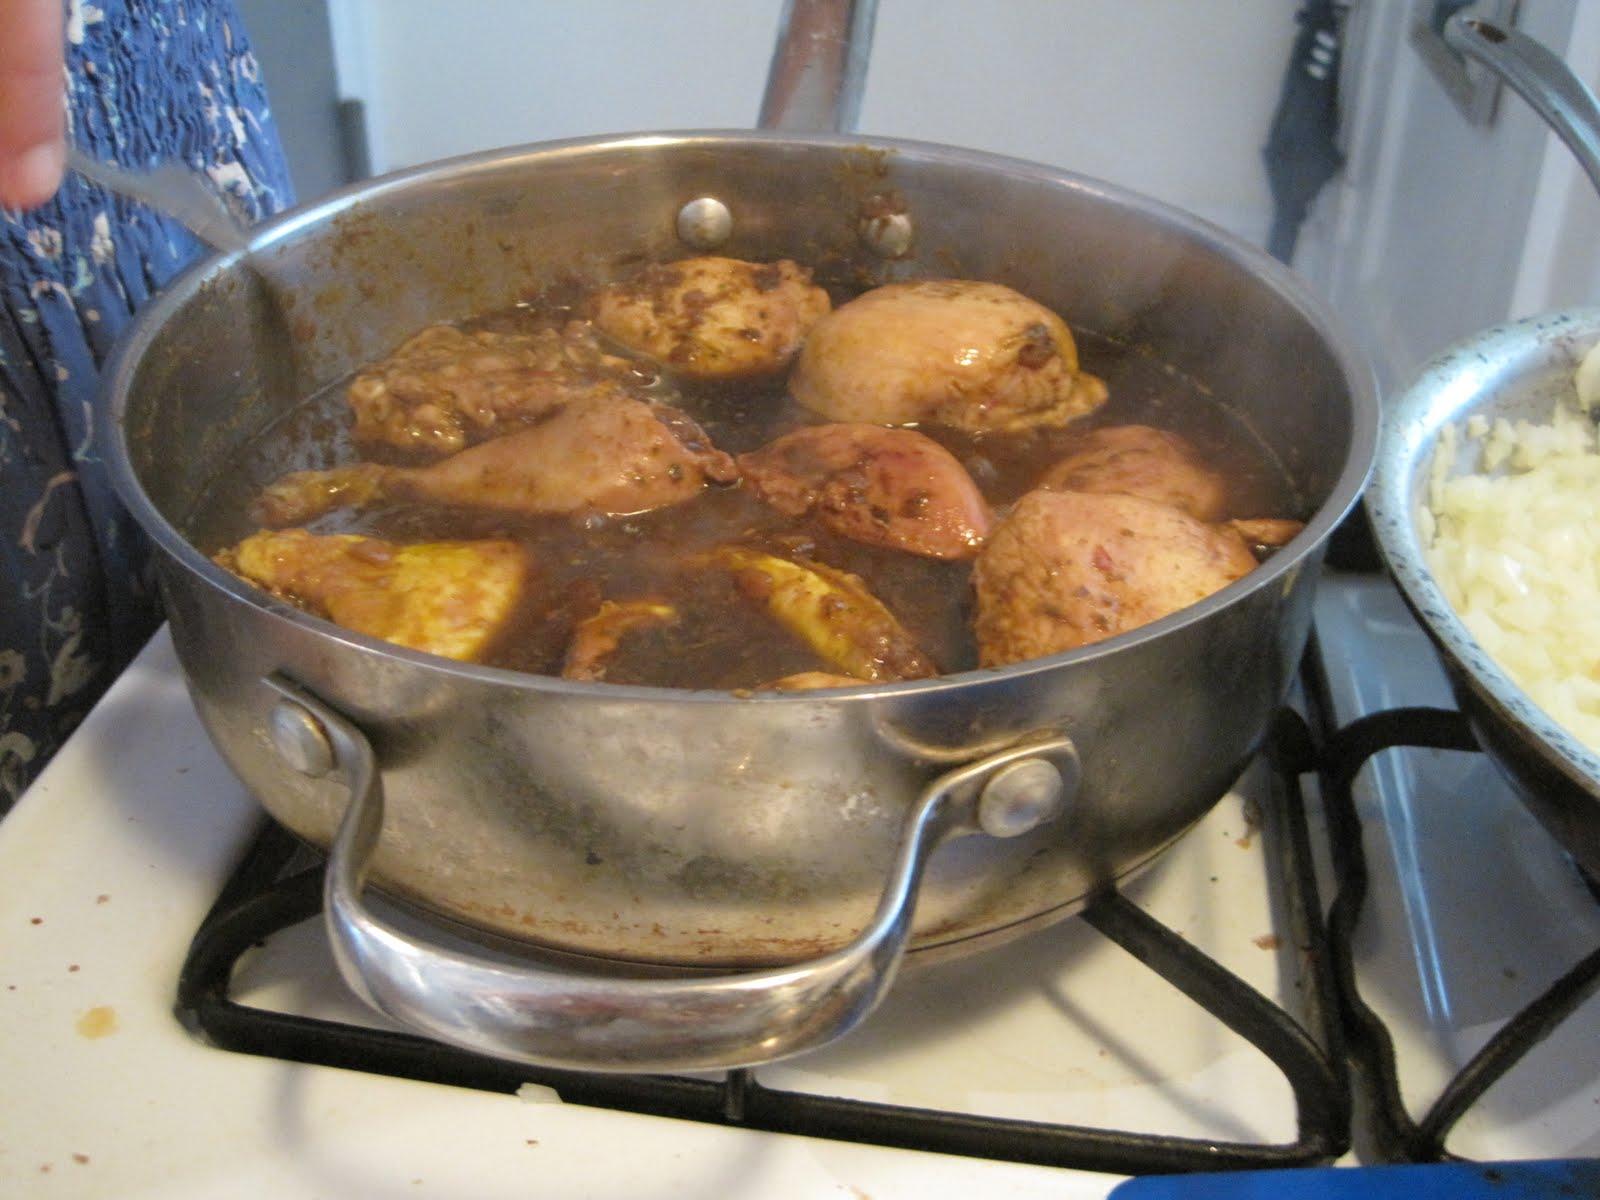 Making Michael Pollan Proud: Doro Wet: Ethiopian Chicken Stew